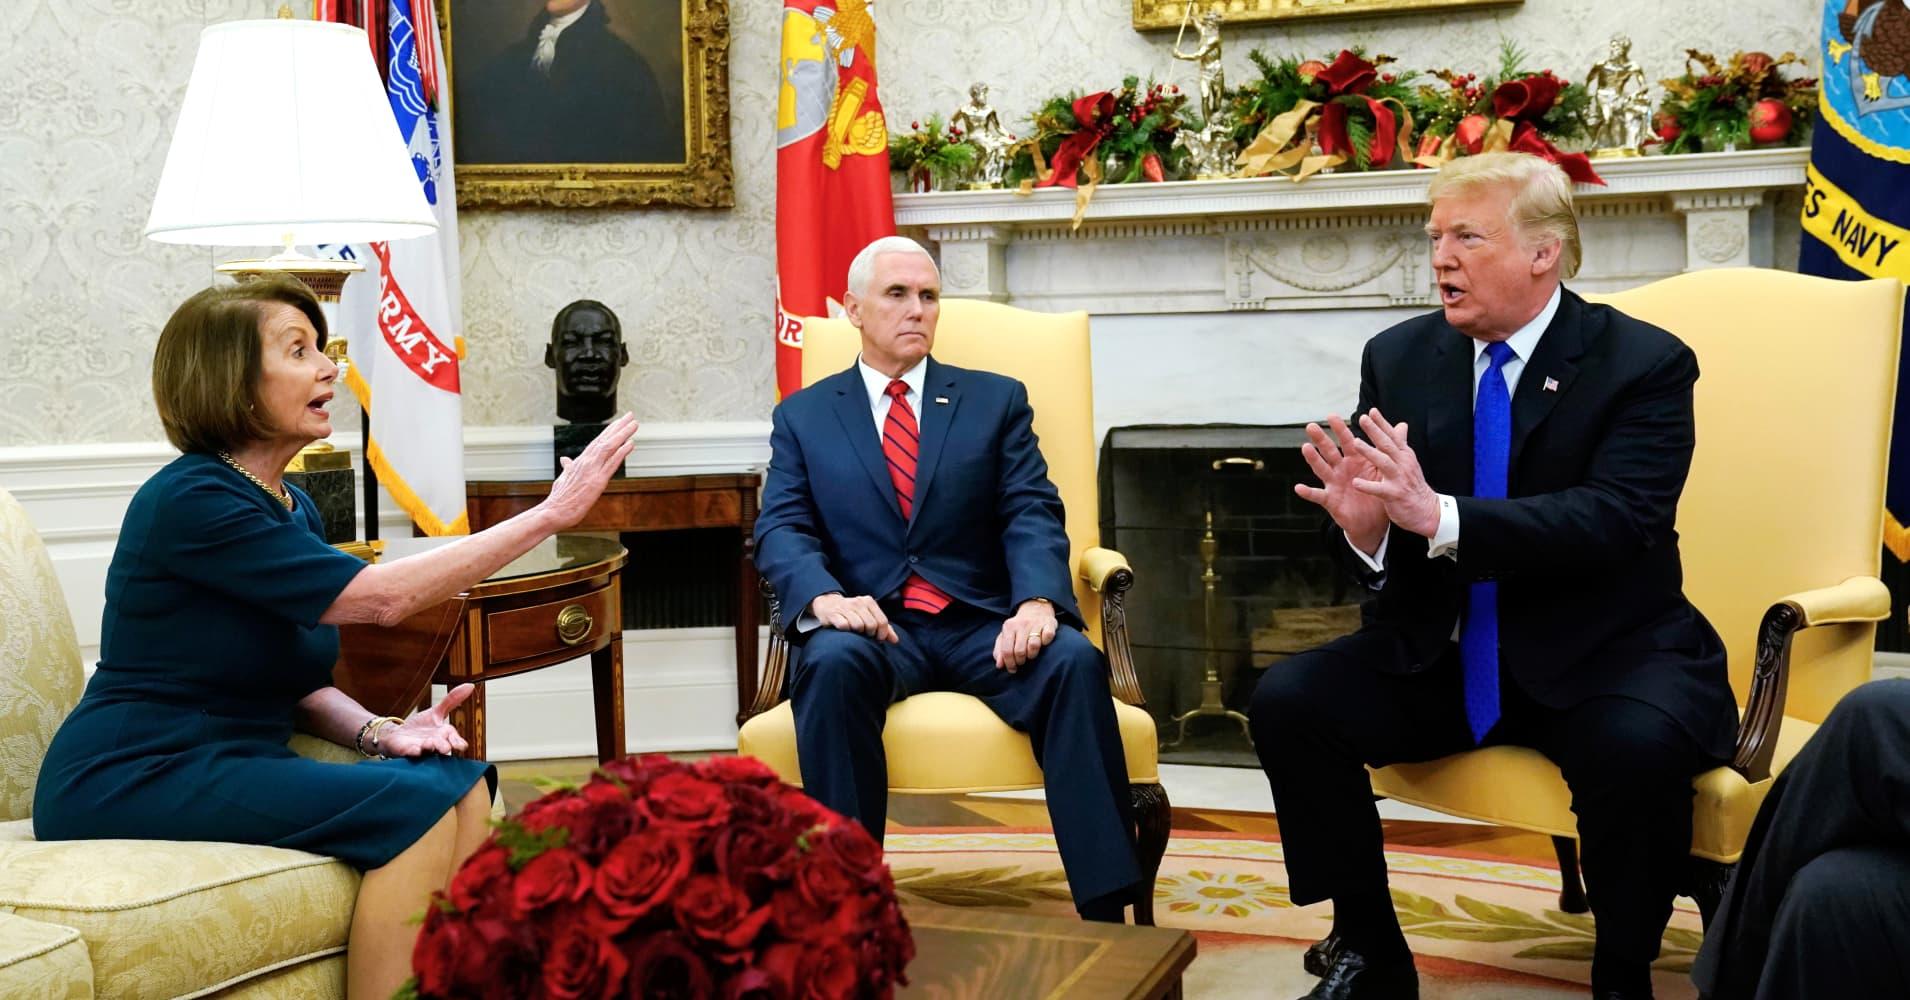 The No. 1 negotiation lesson Trump's border talks teach